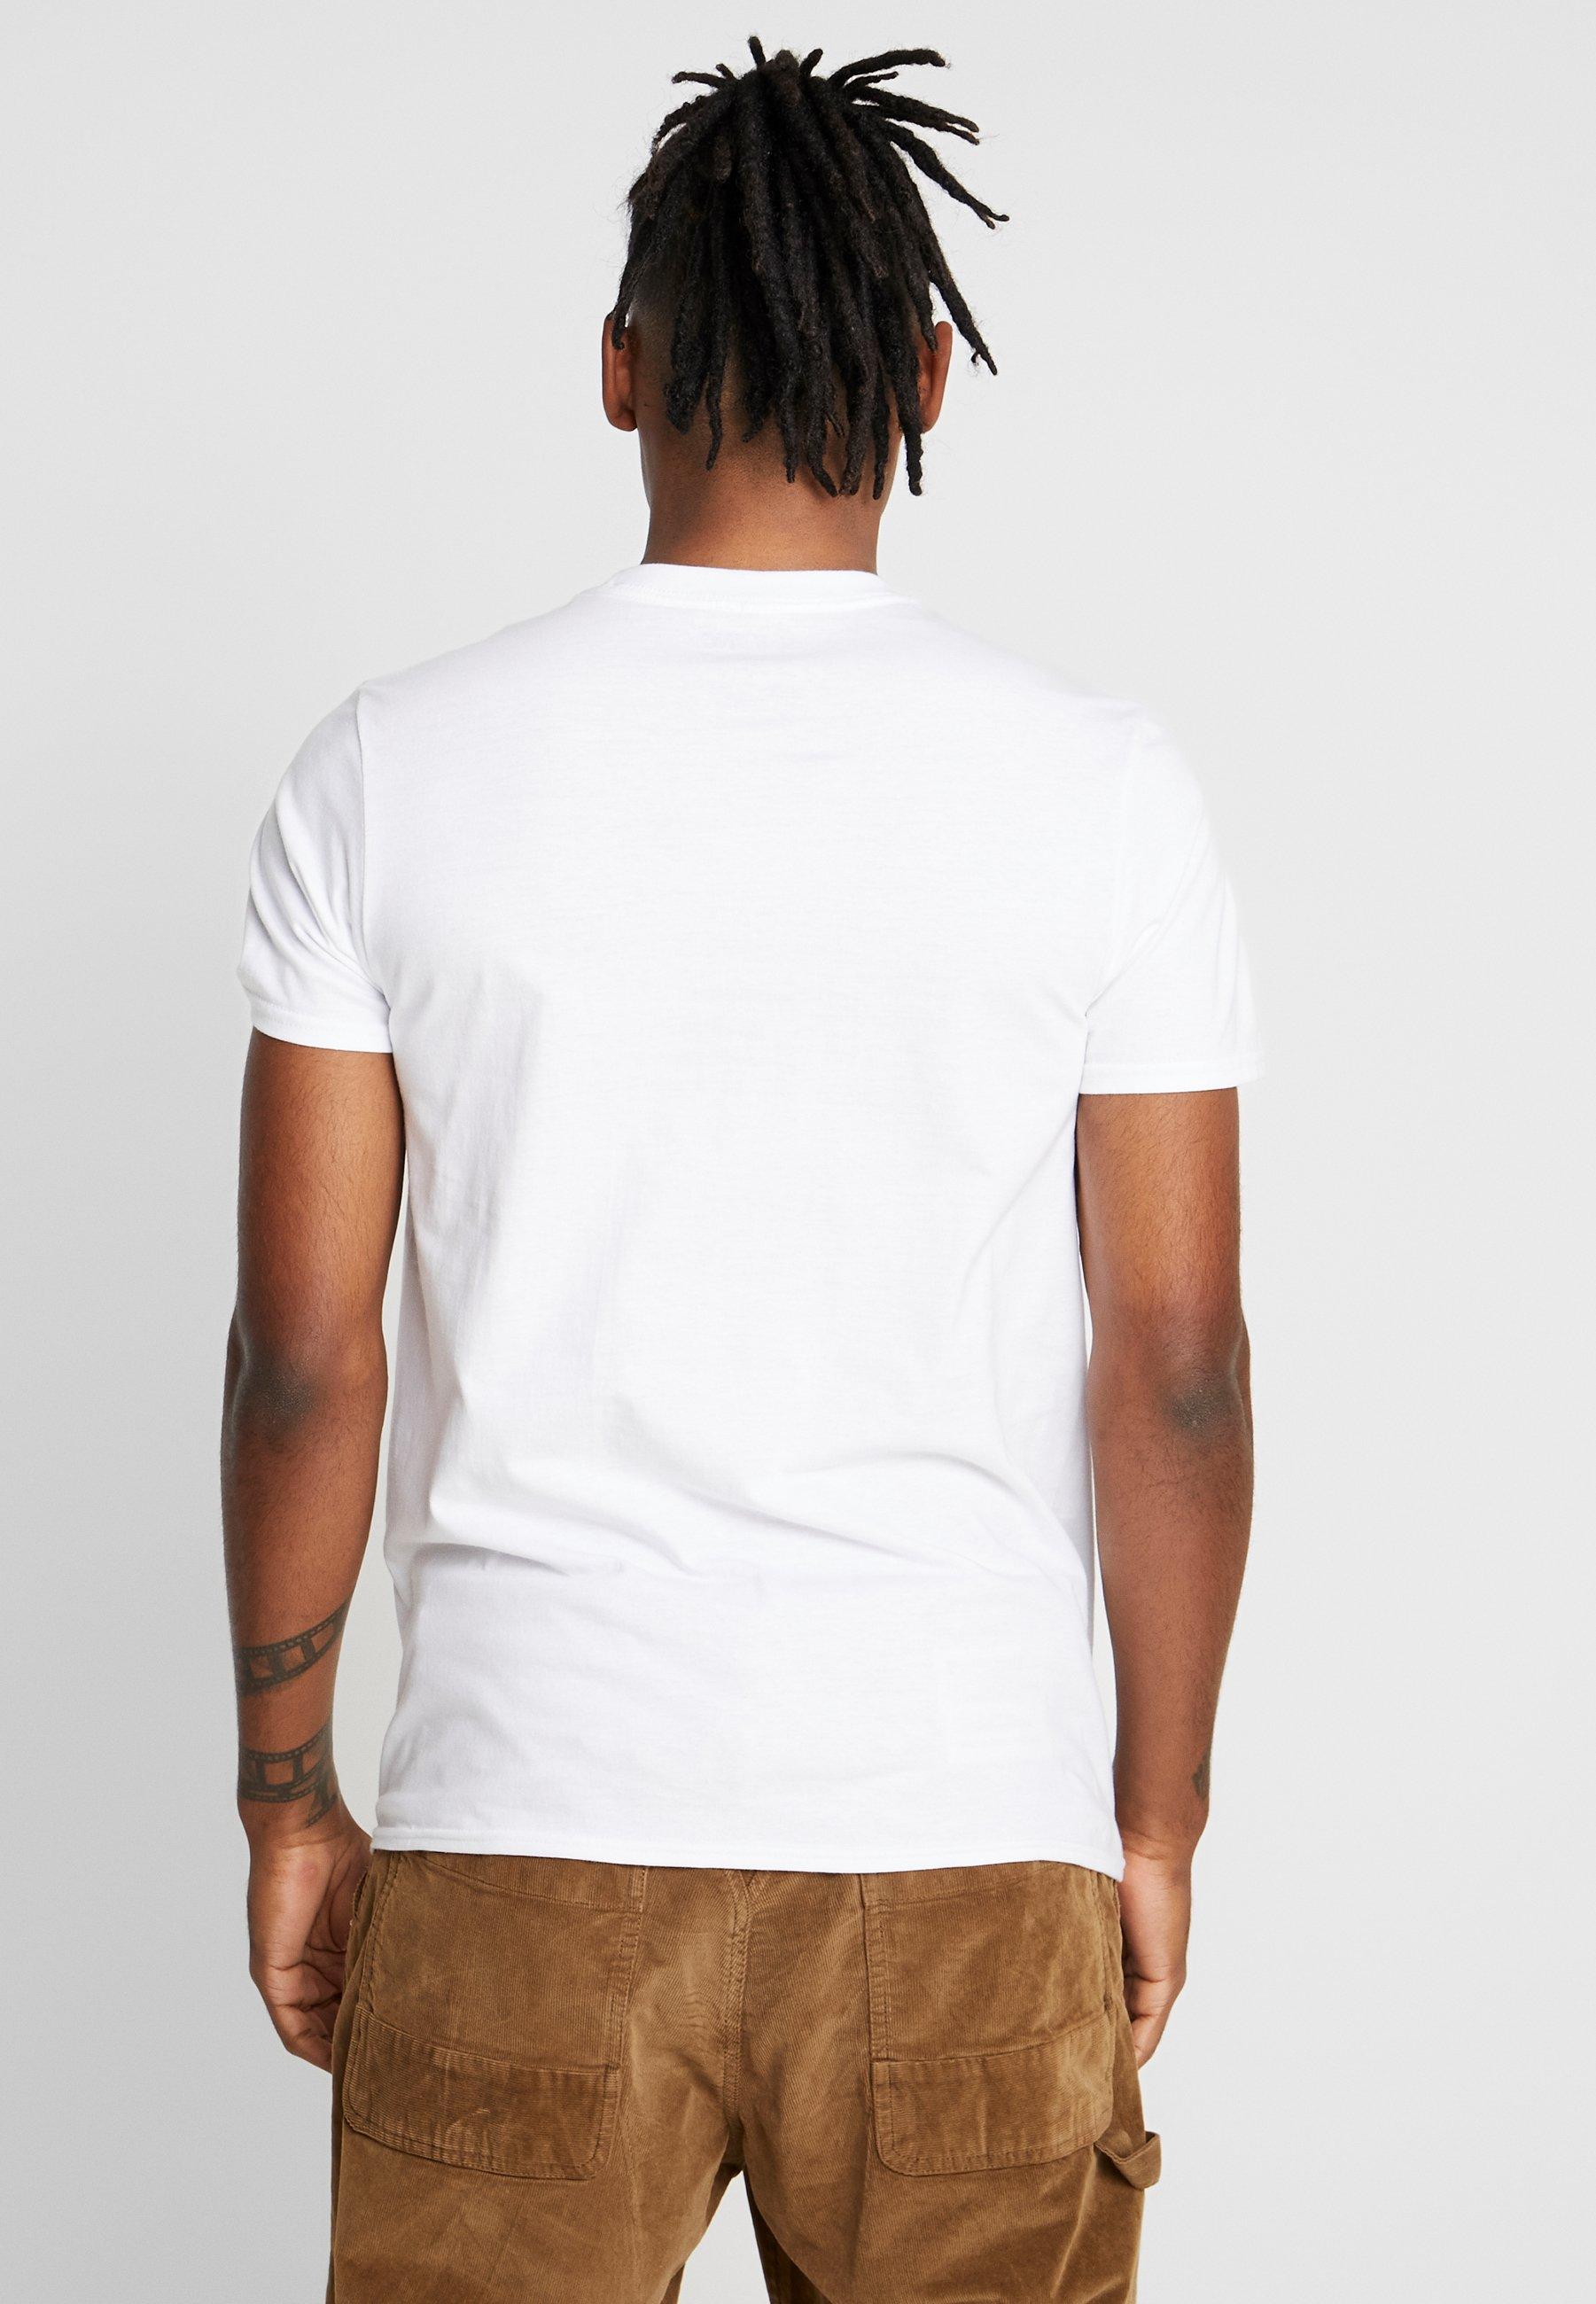 The White Shining Stampa Bioworld TeeT shirt Con KJcuT13Fl5